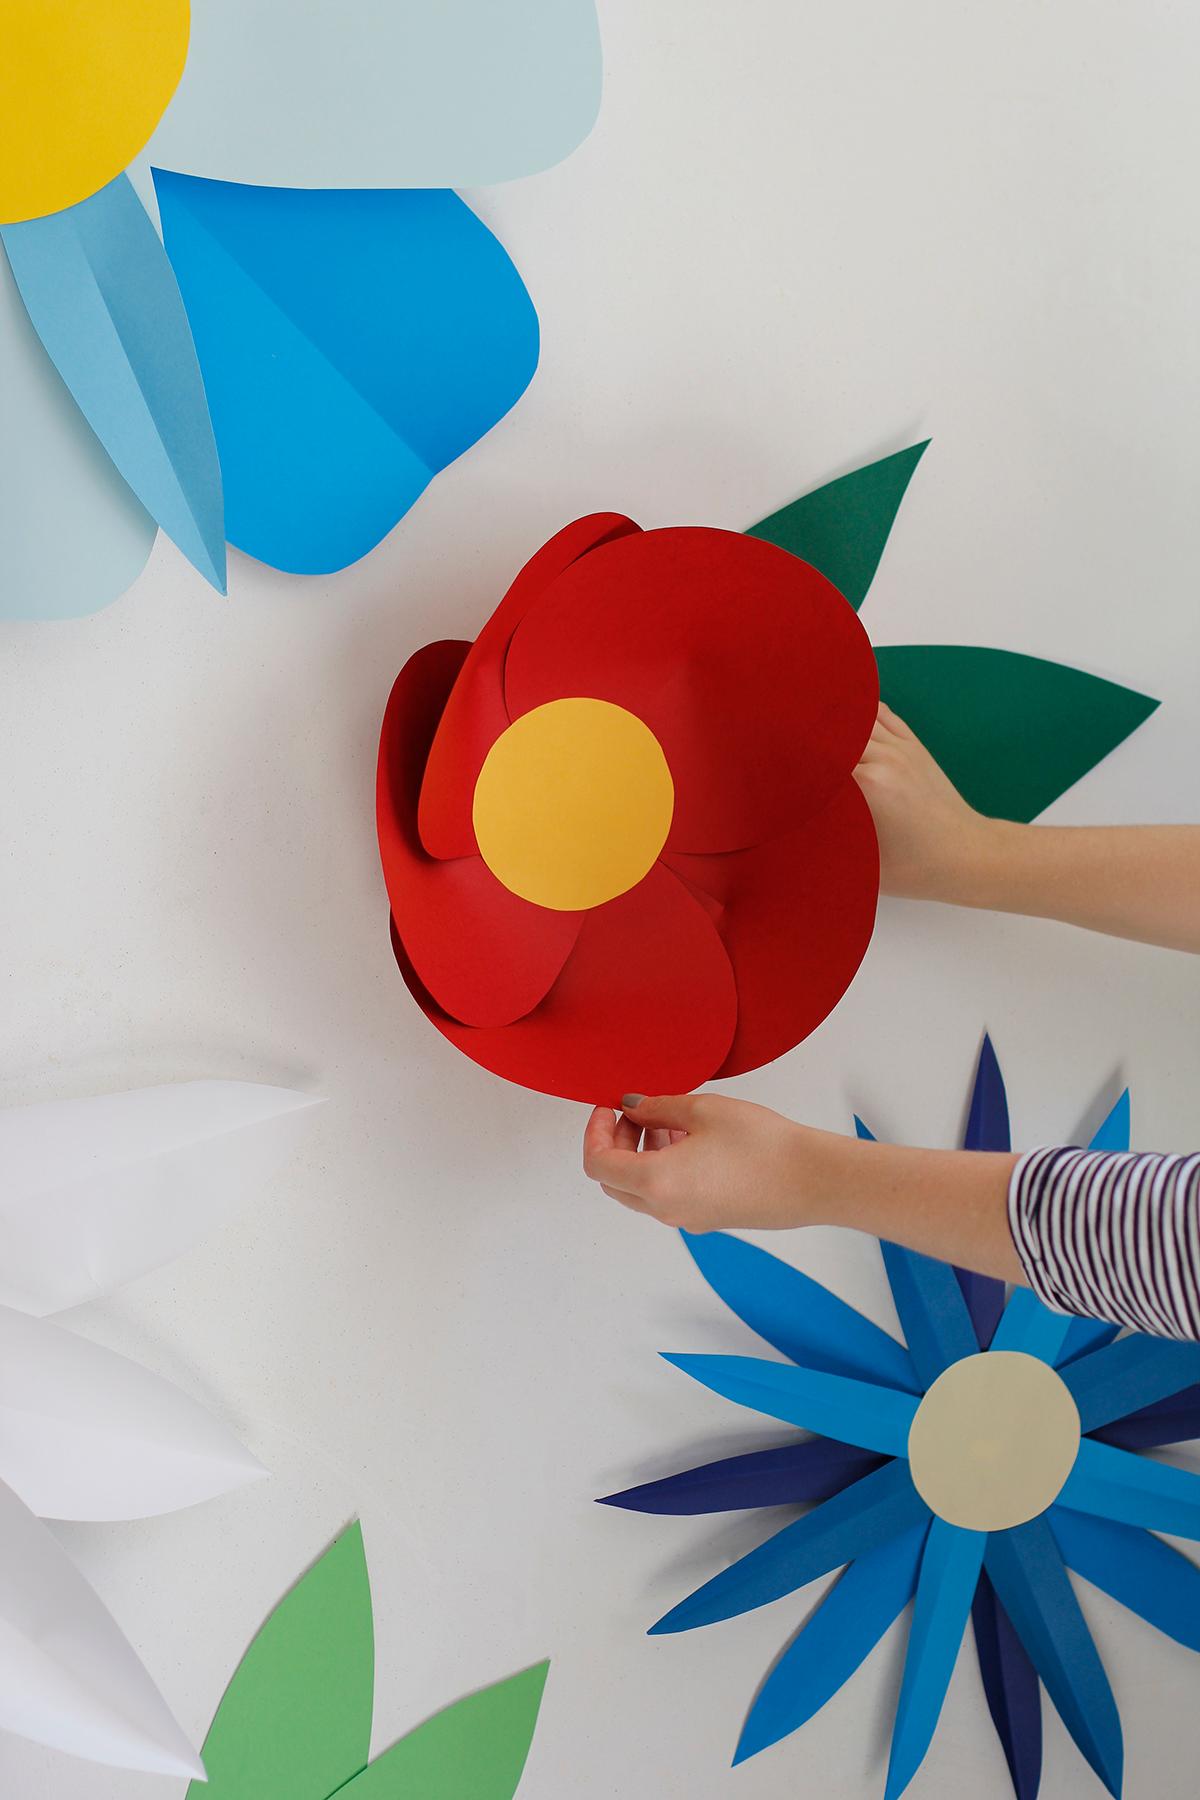 Photo Booth: Papierblumen | we love handmade